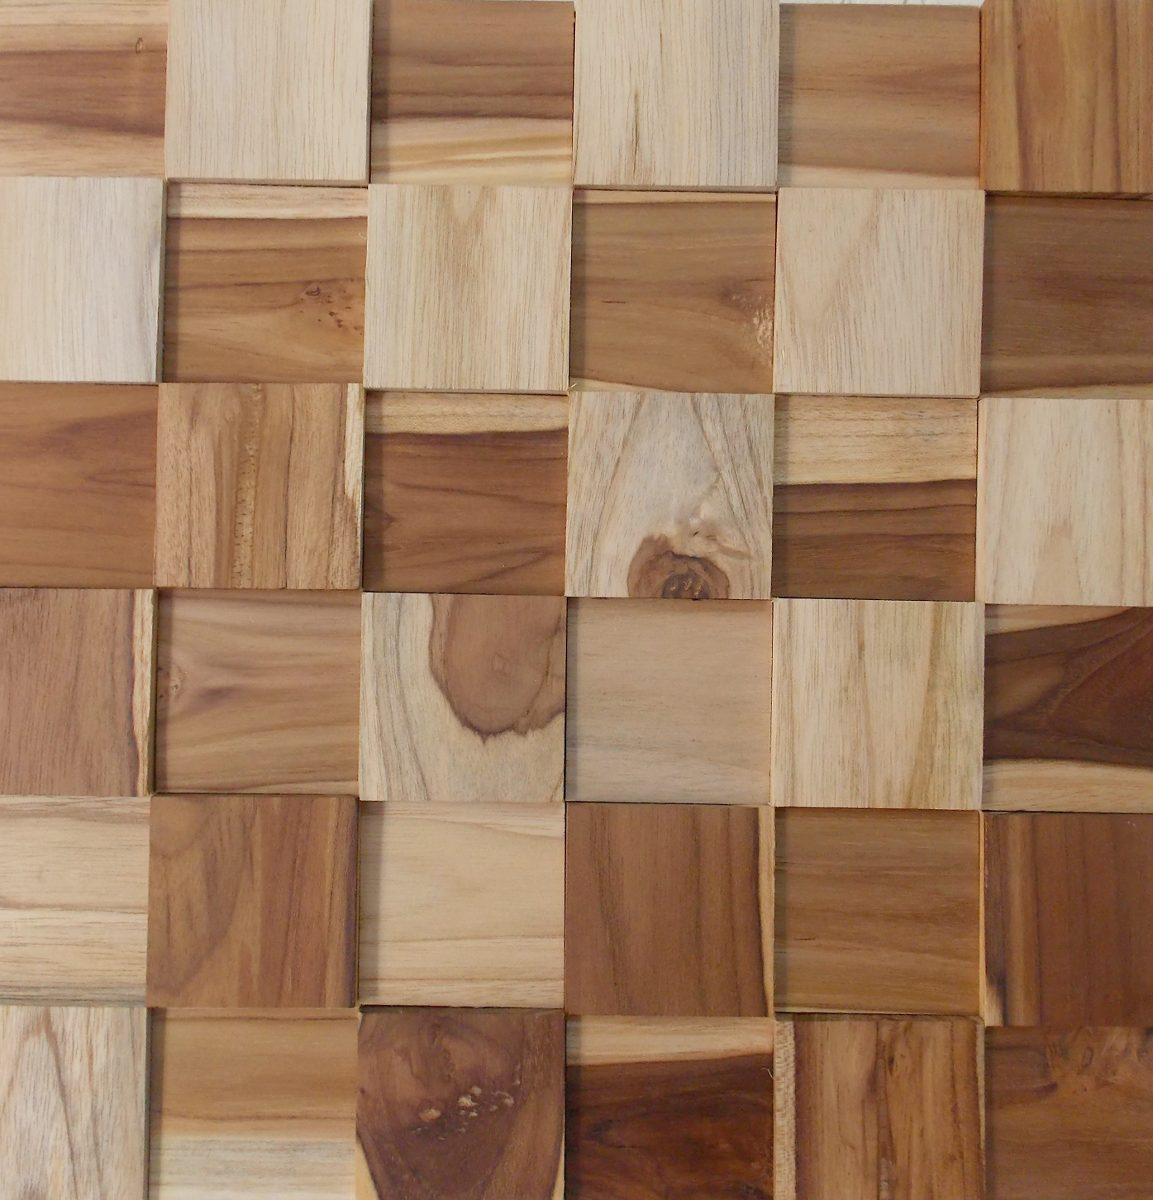 Mosaico madeira teca lisa pastilhas 30cm x 30cm r - Mosaico leroy merlin ...